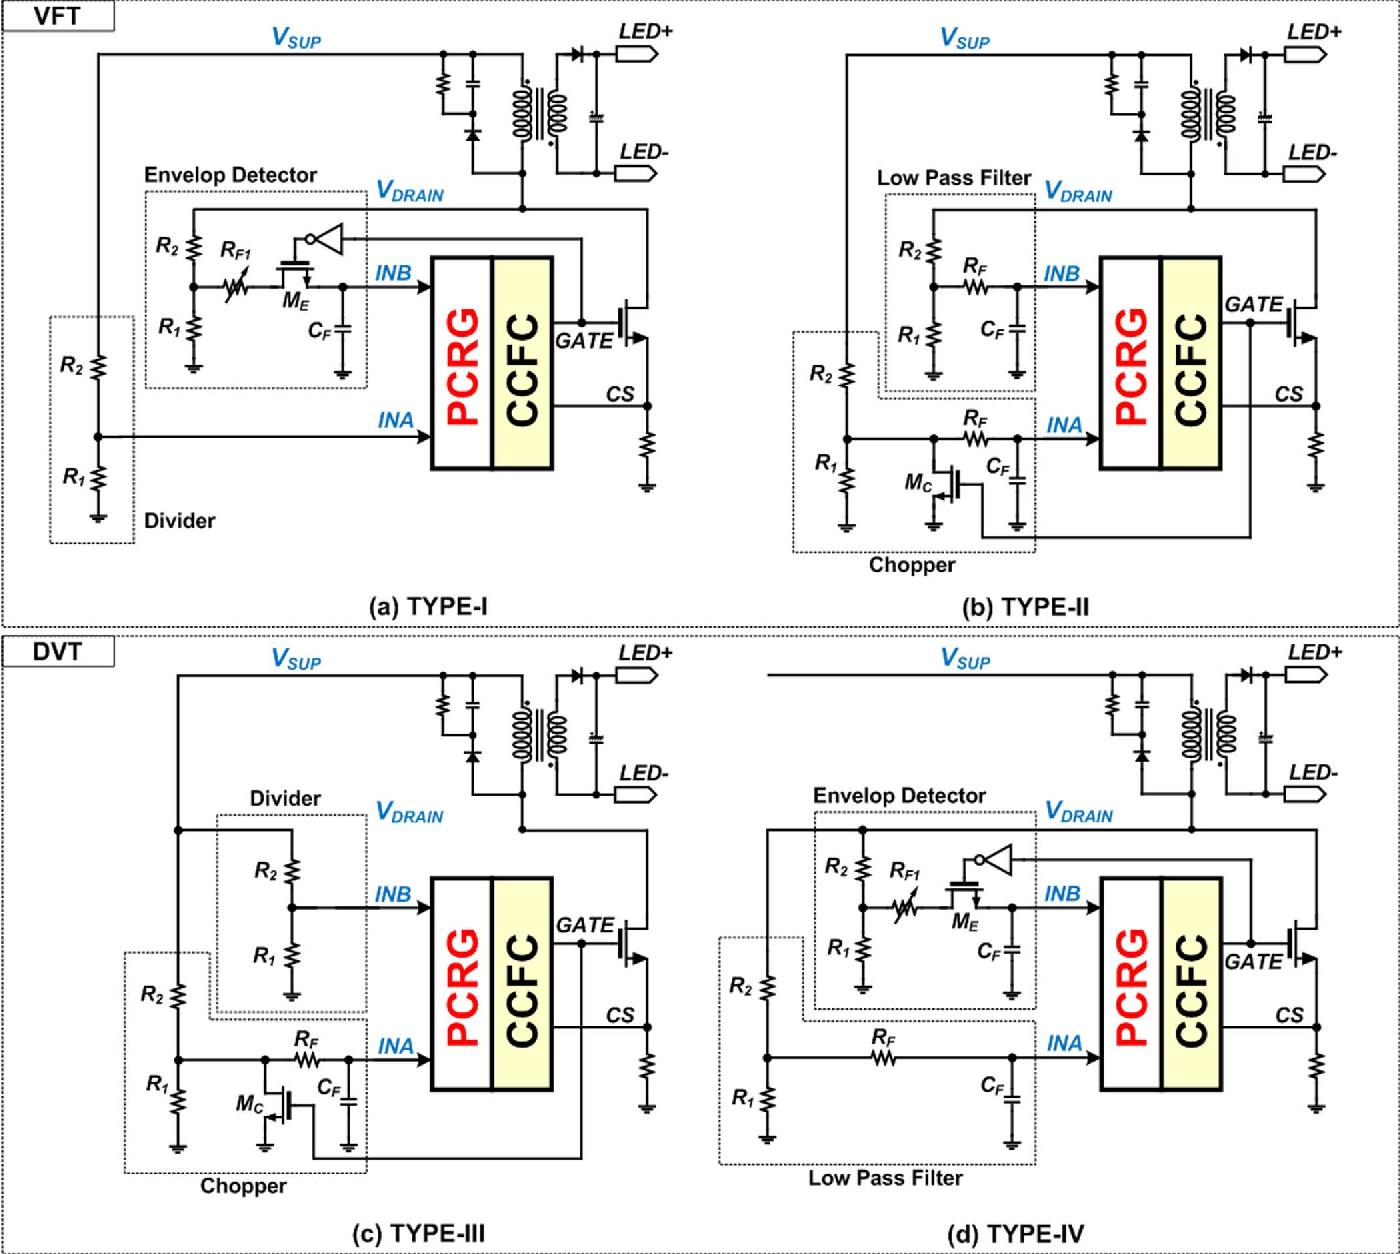 Dimmer For Led Circuit Diagram